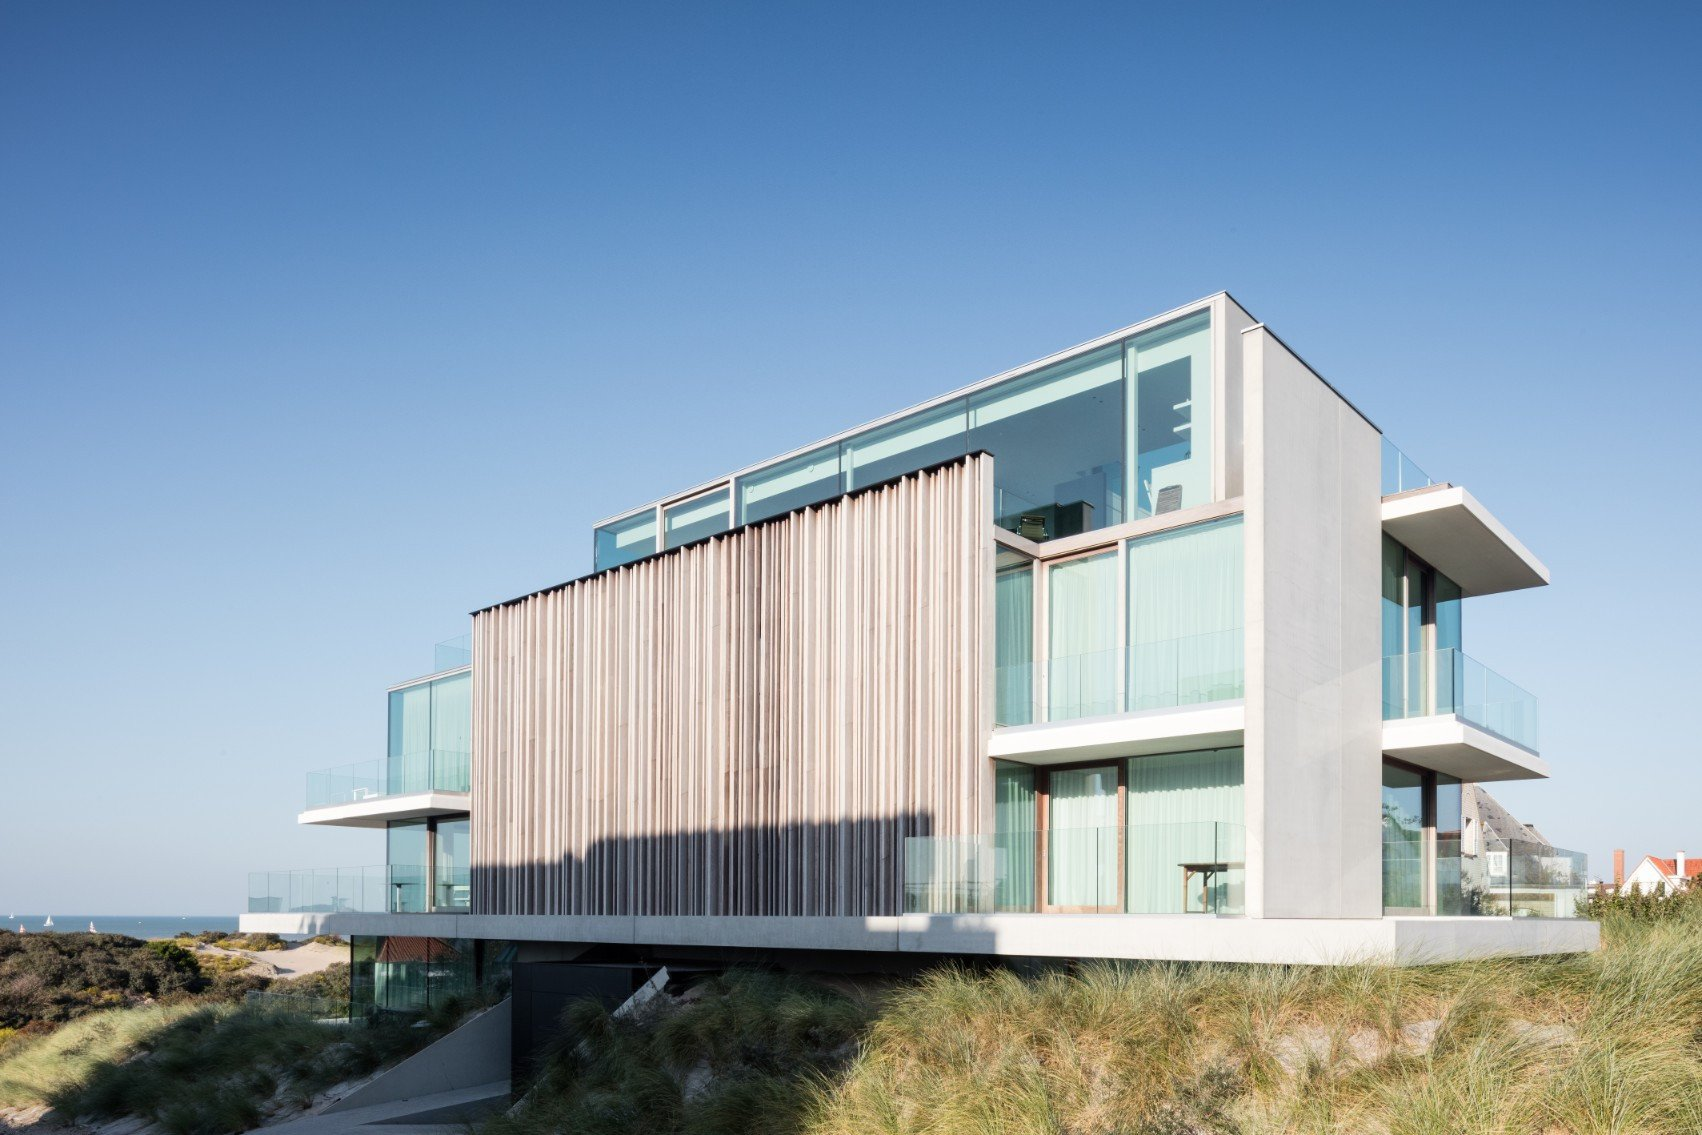 Rietveldprojects-Residence-ON-appartement-design-architectuur-kust-tvdv5.jpg